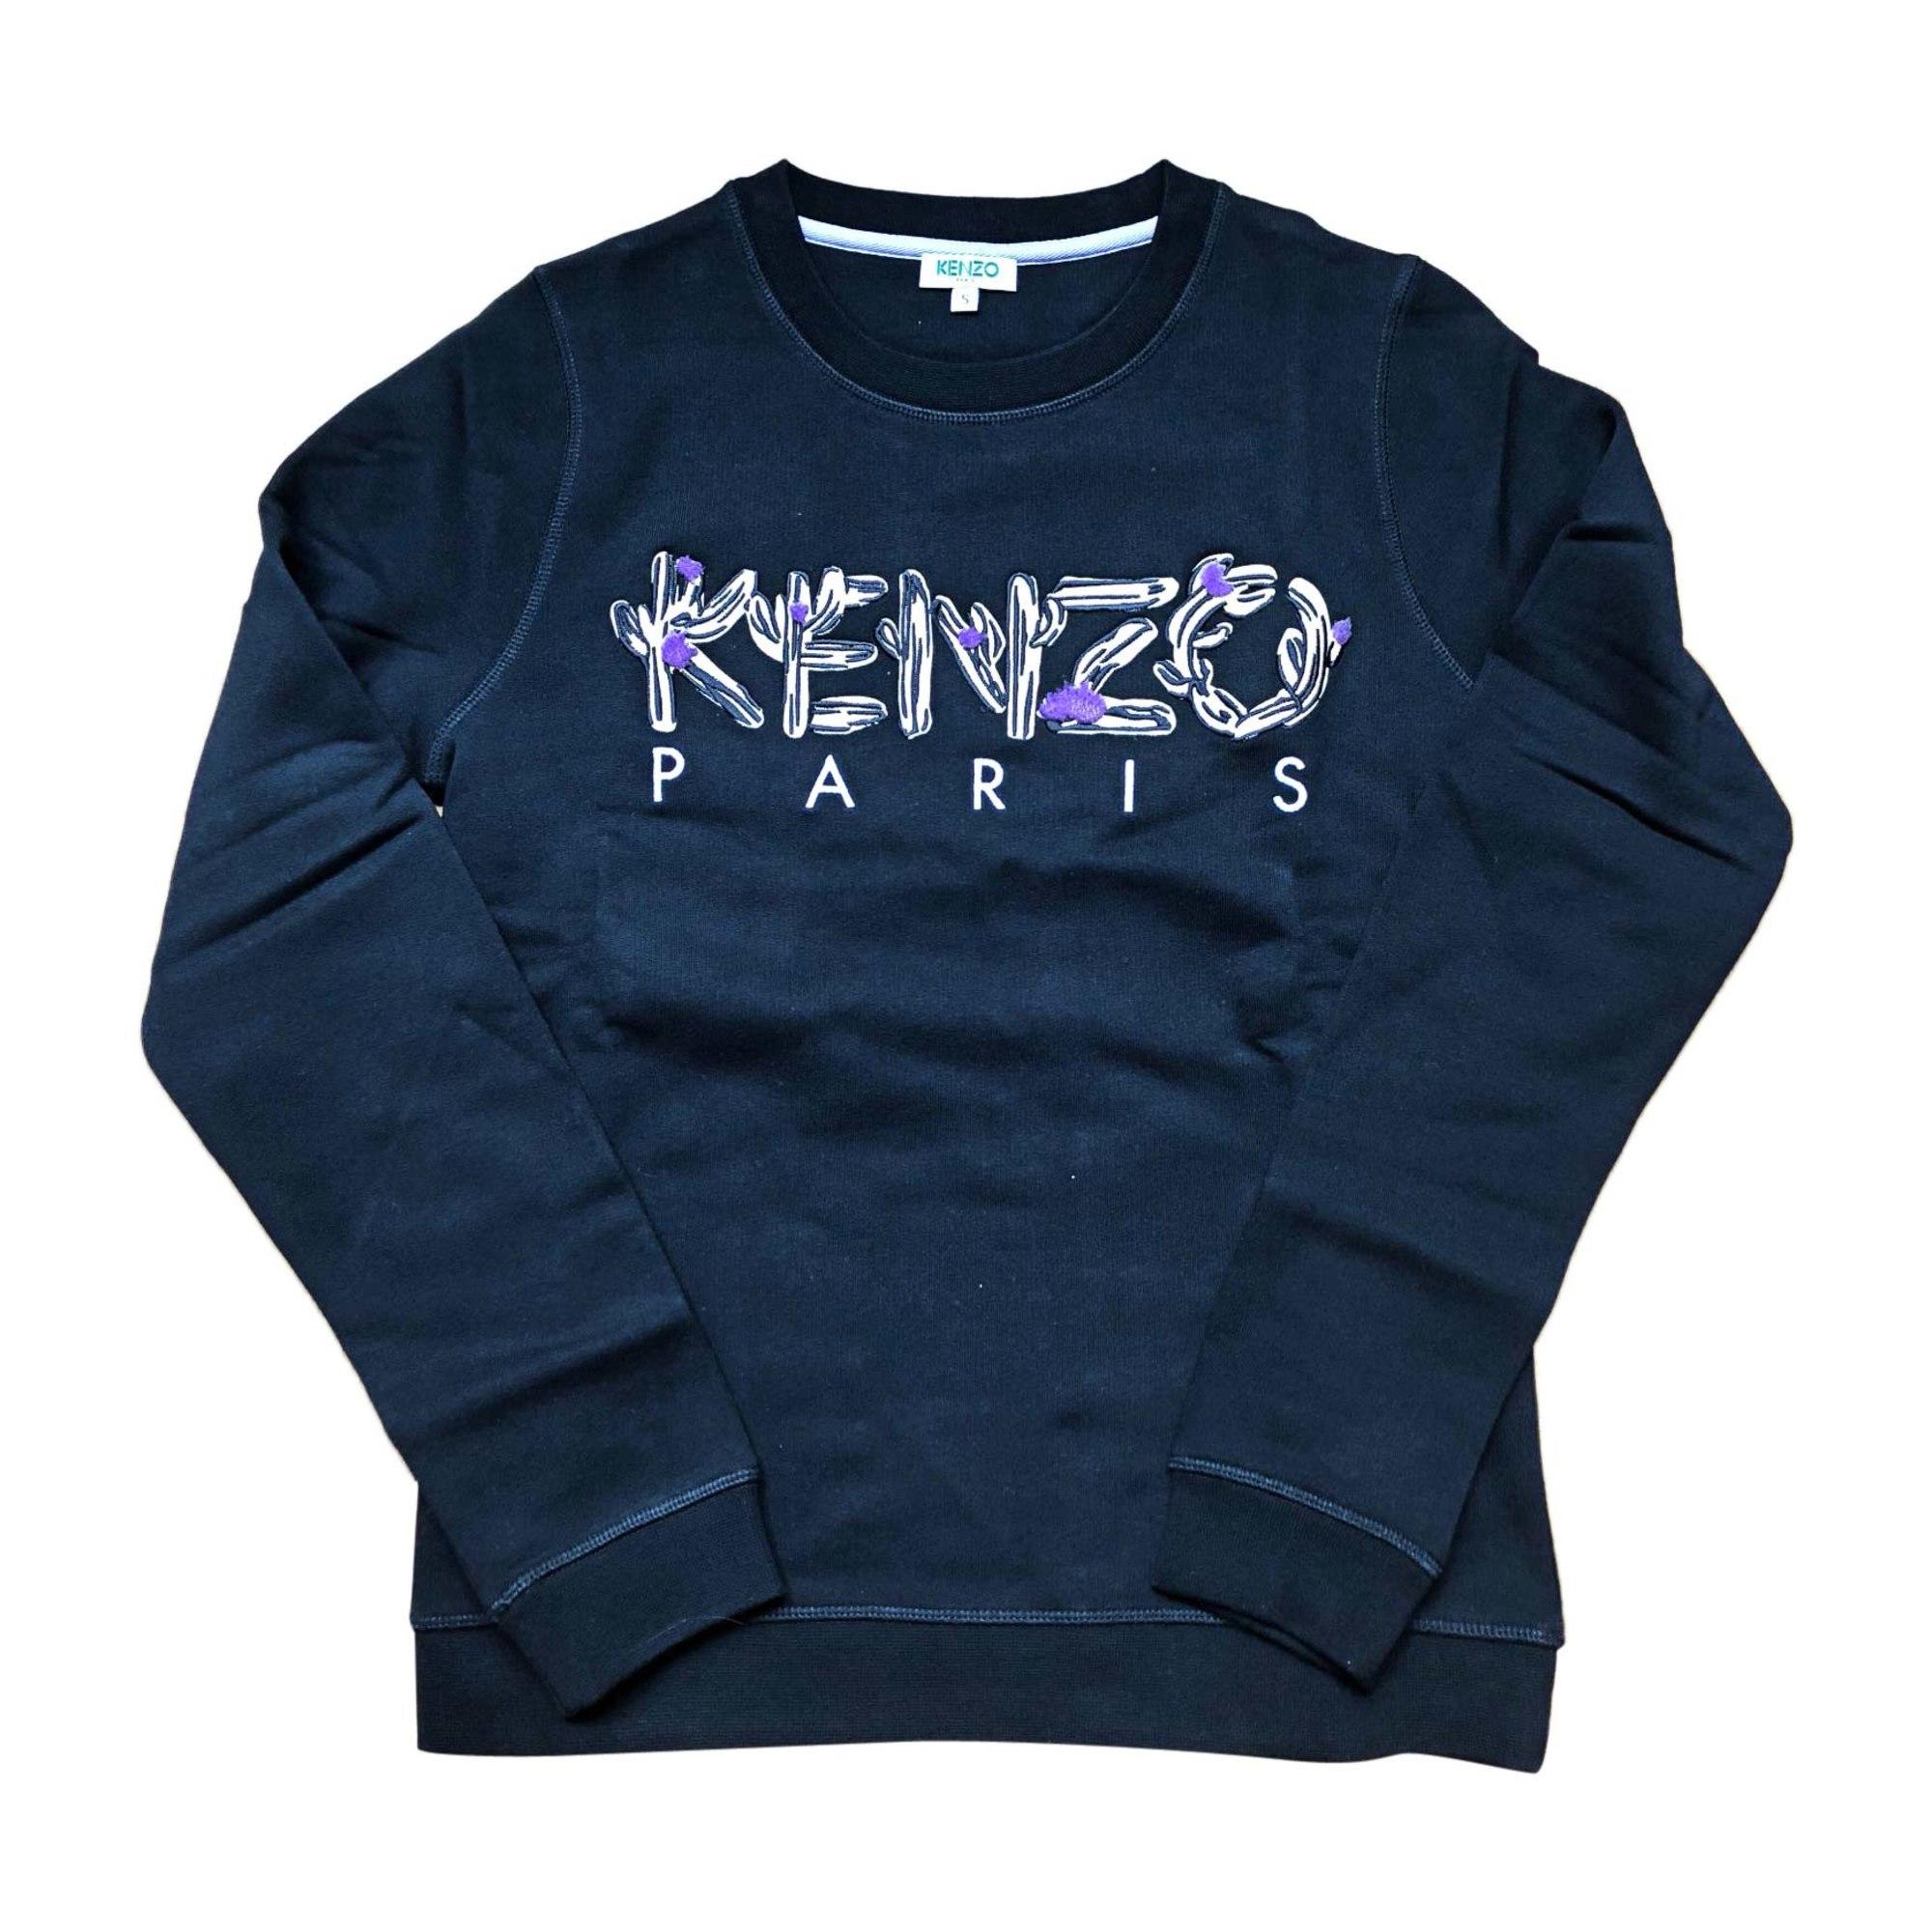 Sweat 7535685 Par Kenzo s T1 Noir 36 Katerinanitekari Vendu pprxqT